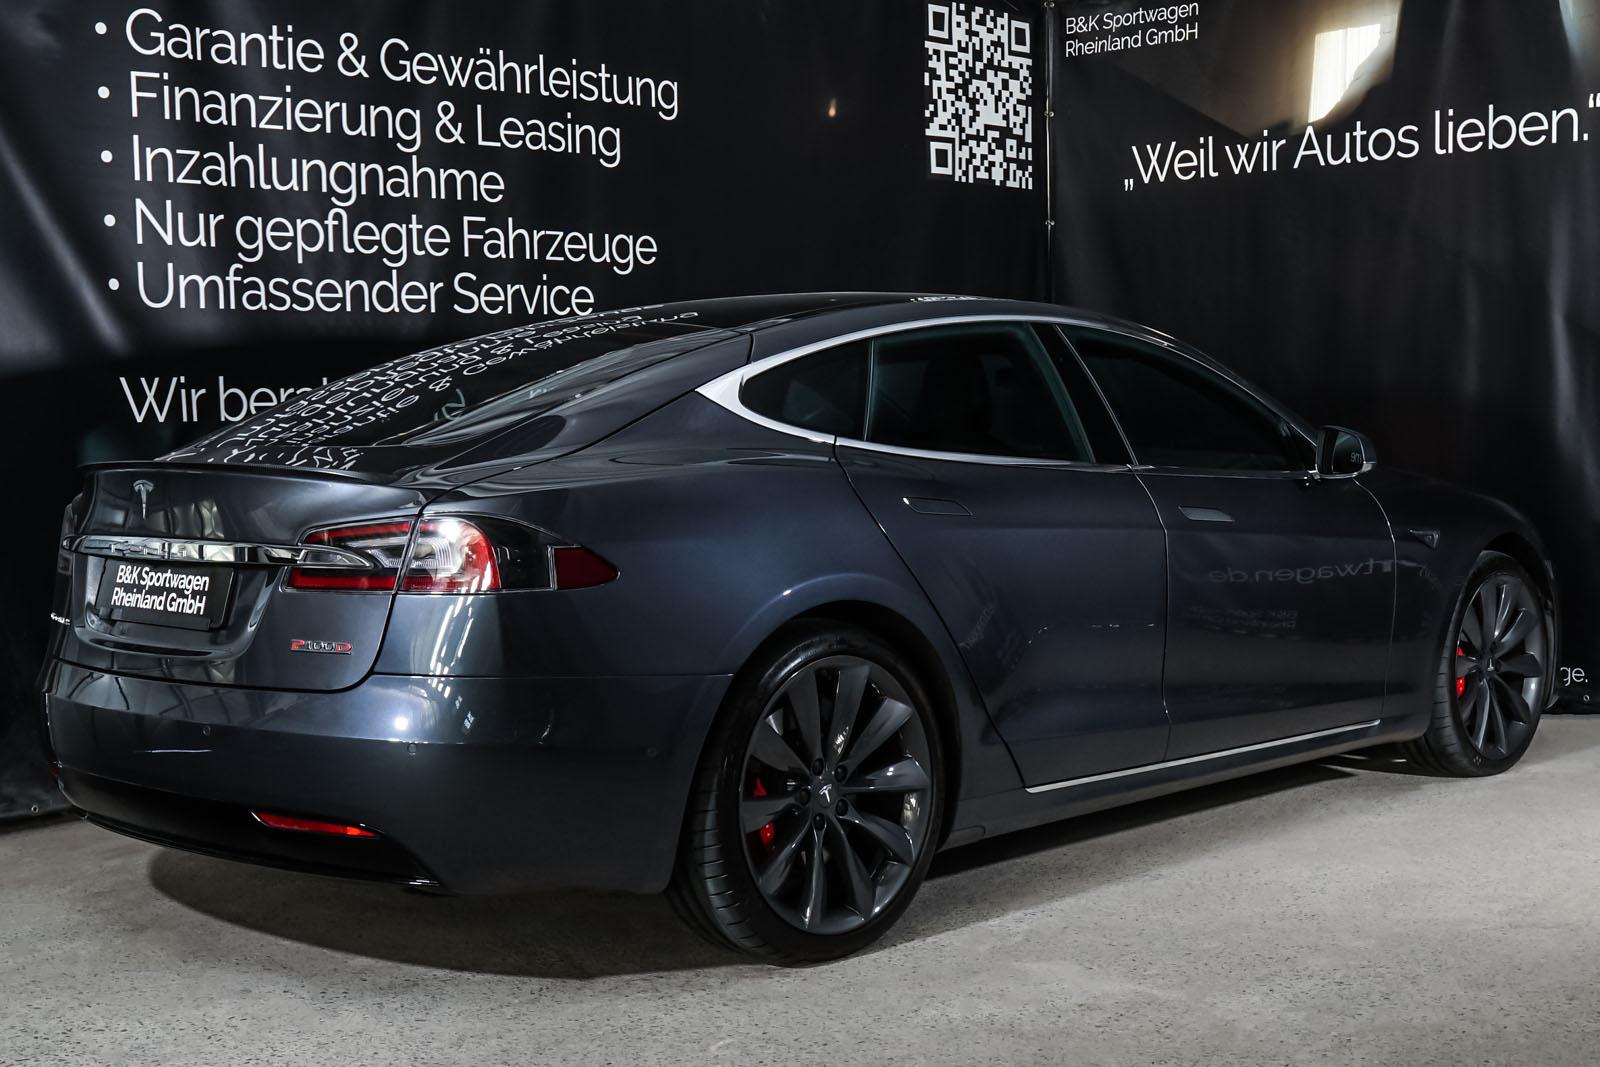 Tesla_ModelS_P100D_MidnightSilver_Black_TES-6539_14_w